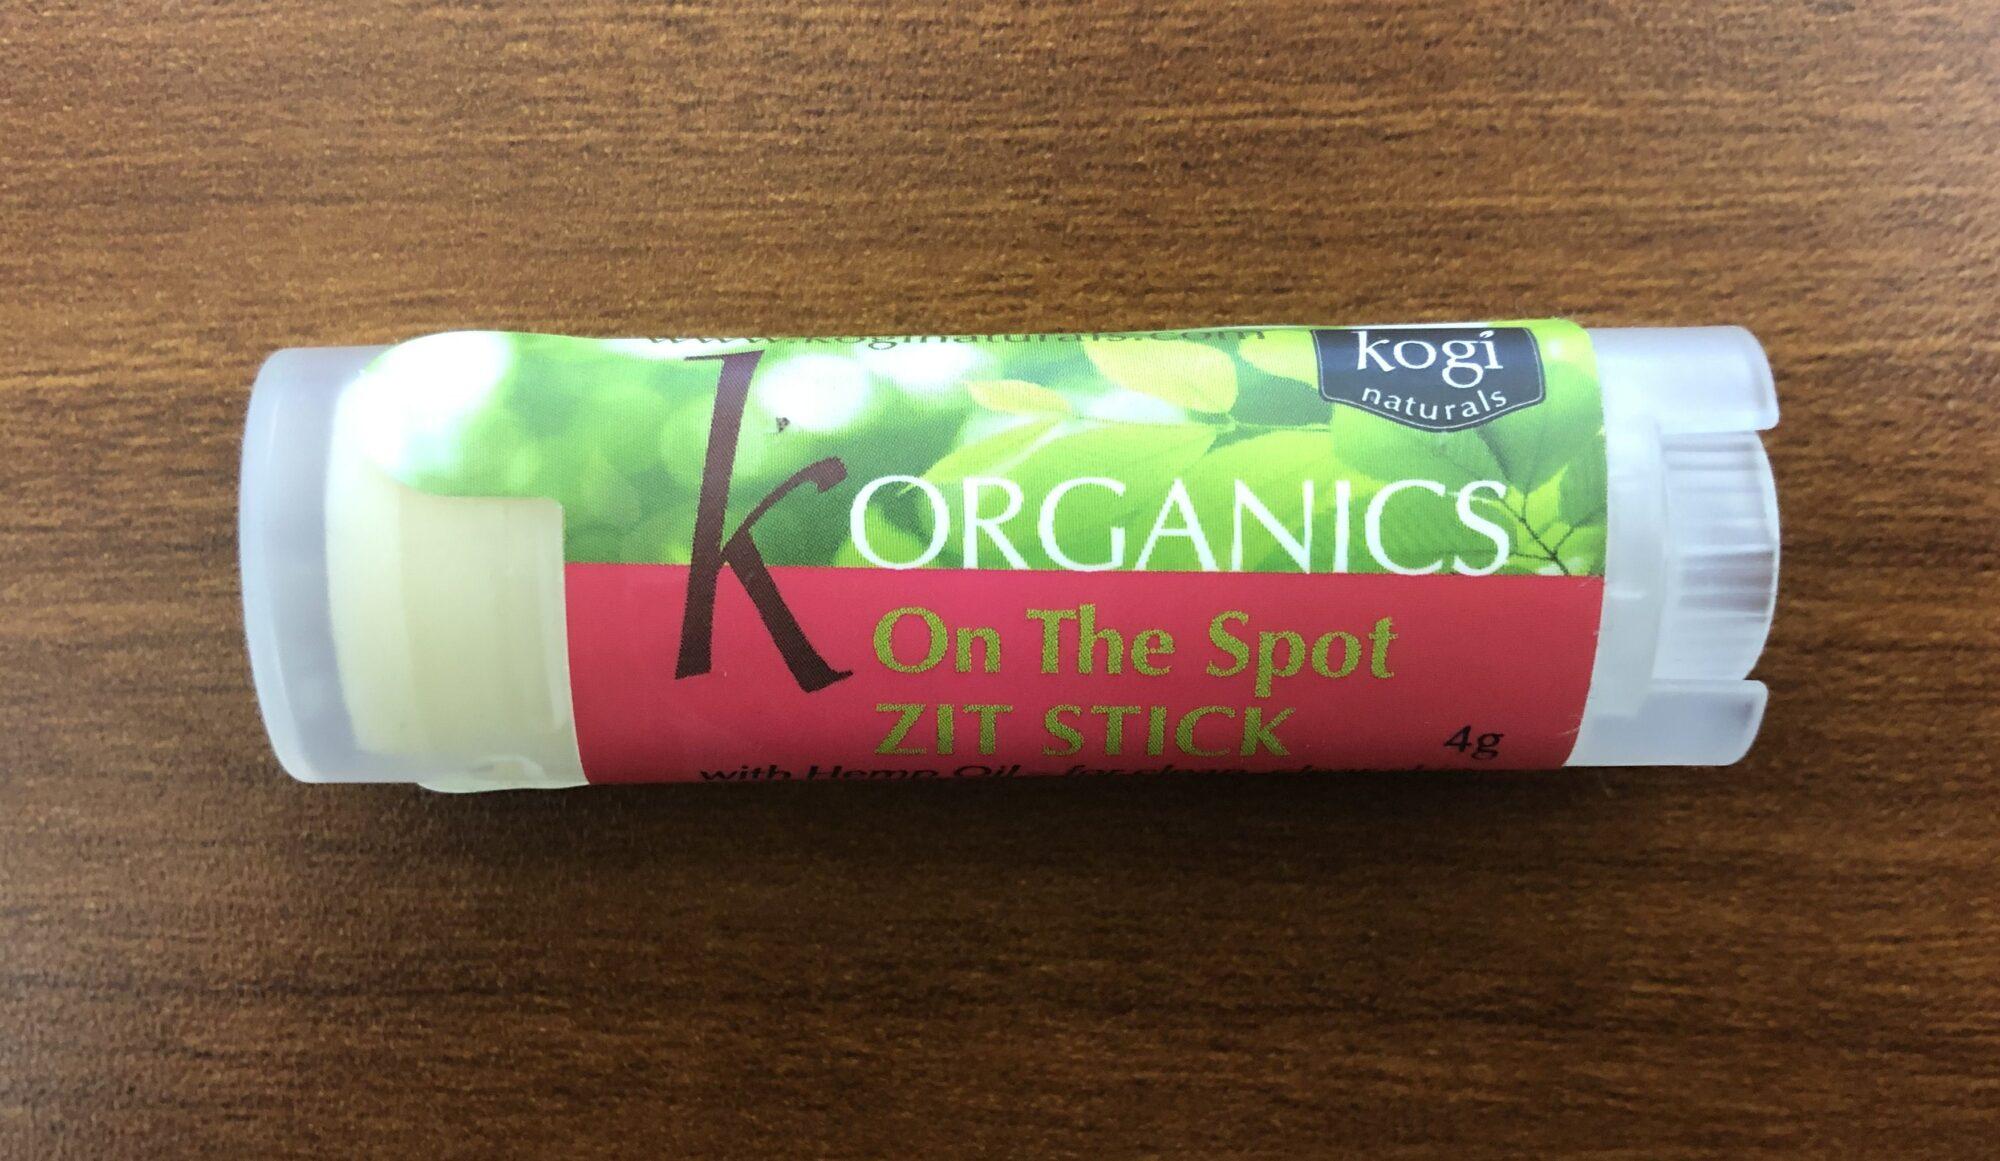 KOJI Organics On The Spot Zit Stick 4g